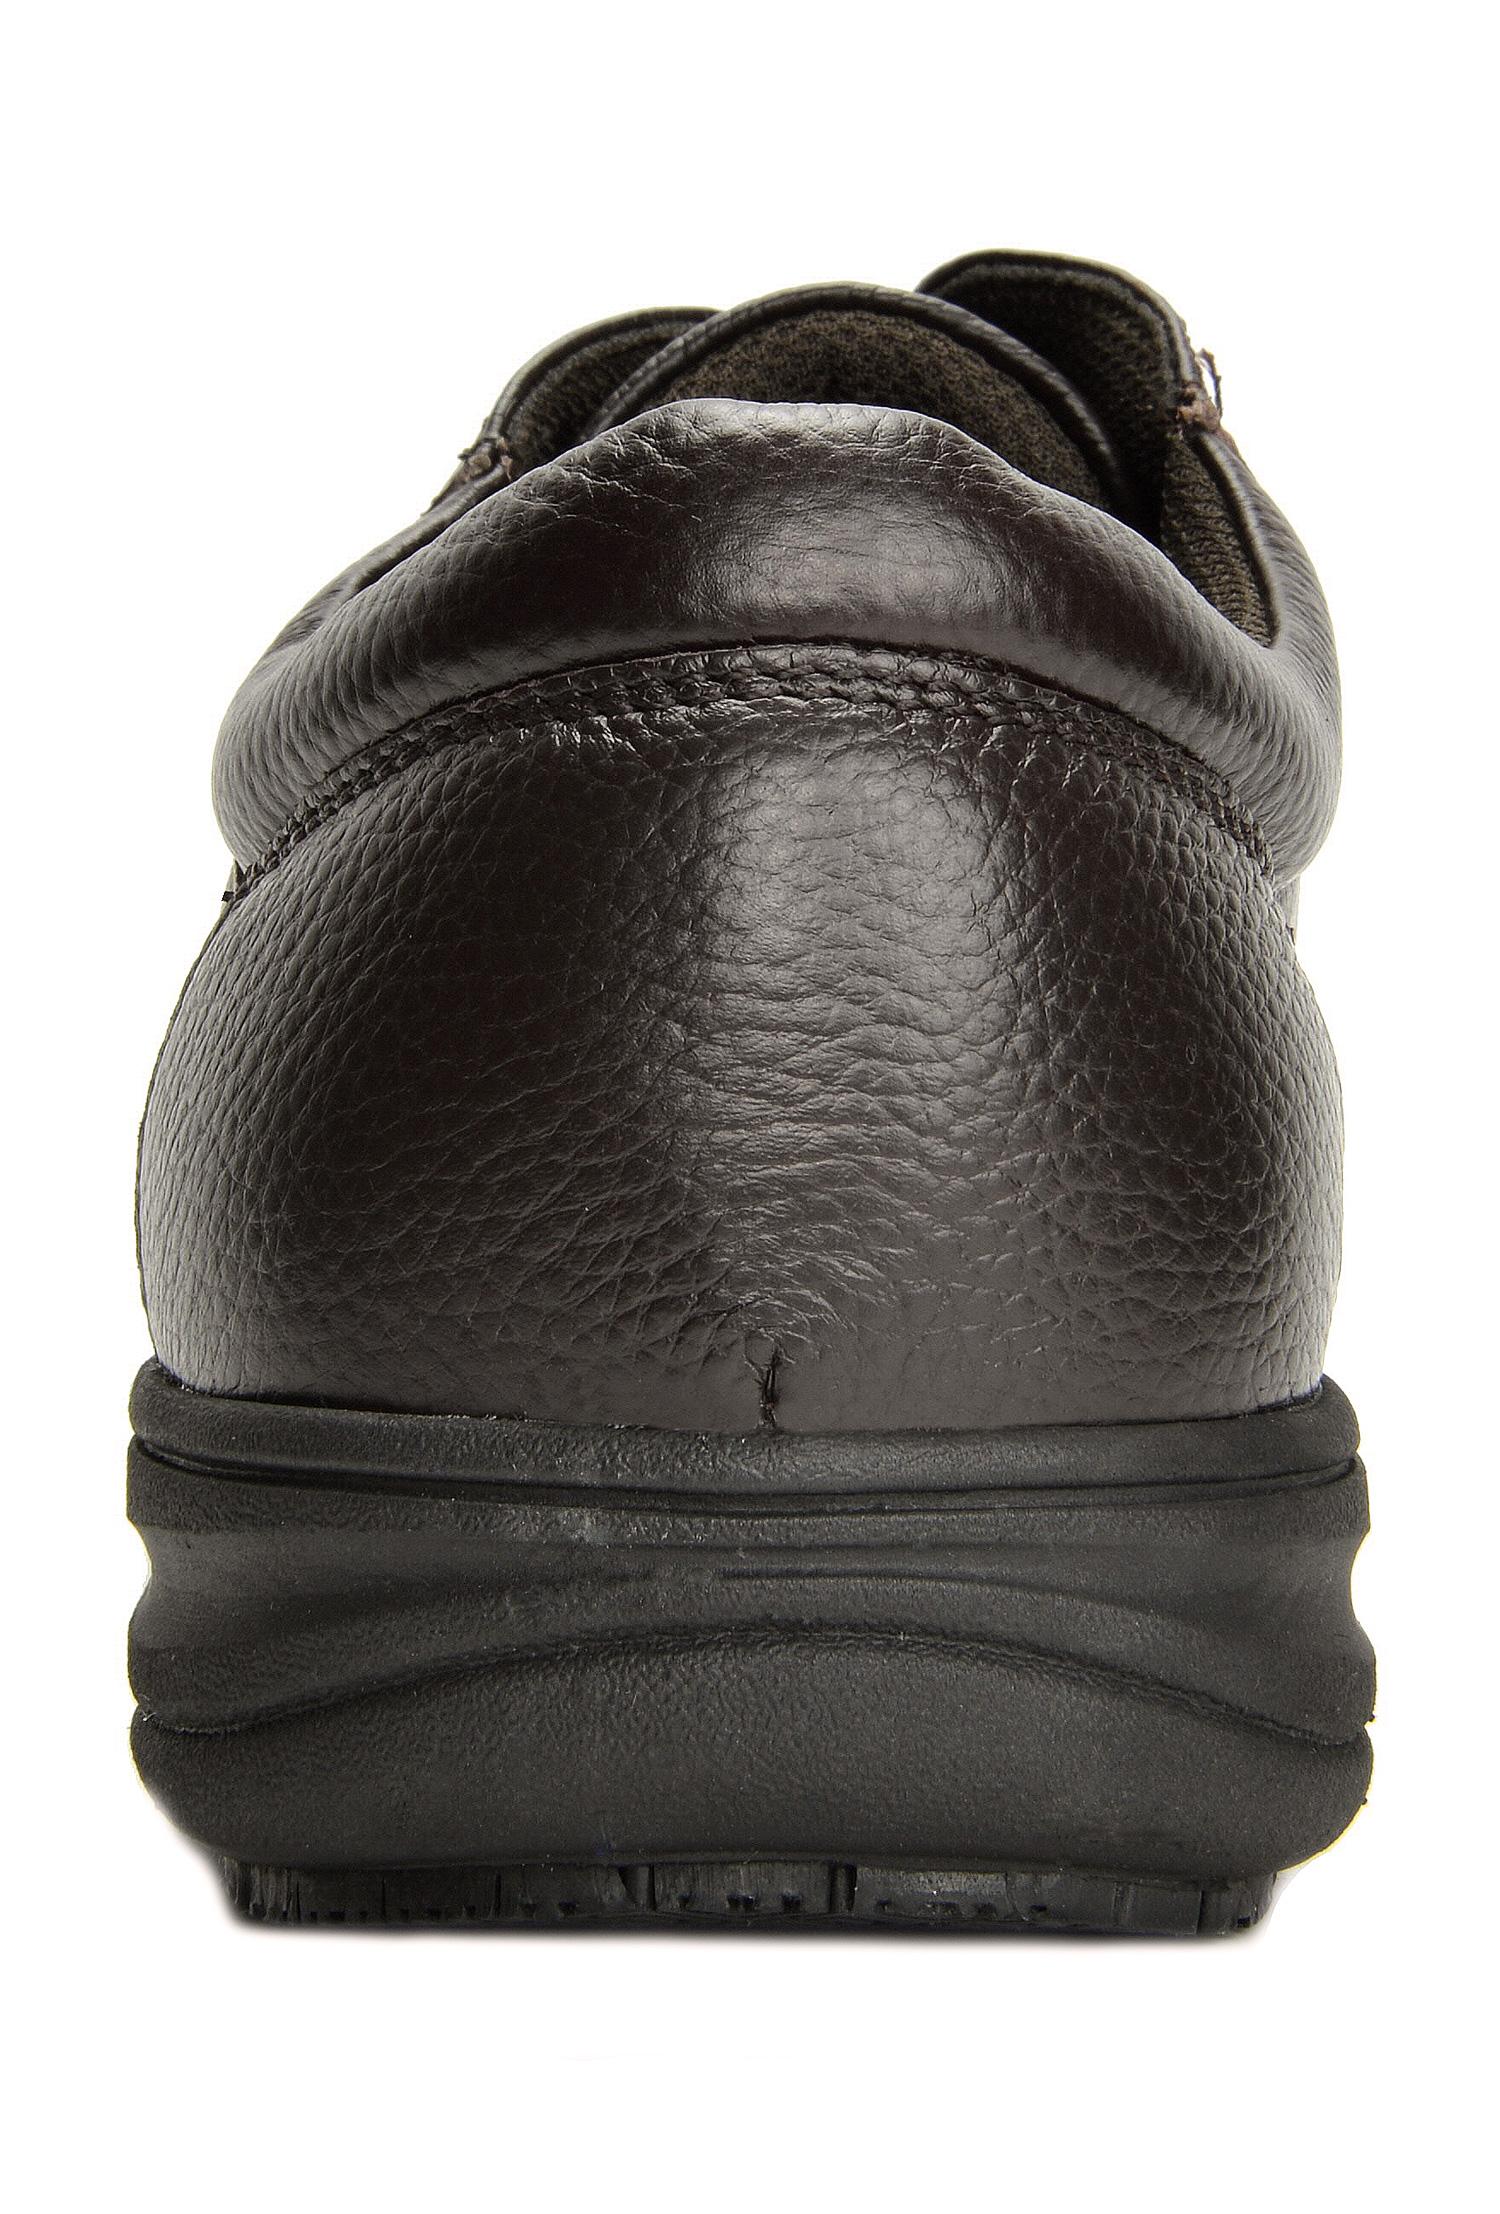 DREAM PAIRS Men Restaurant Slip Resistant Classic Lace Up Oxfords Work Shoes